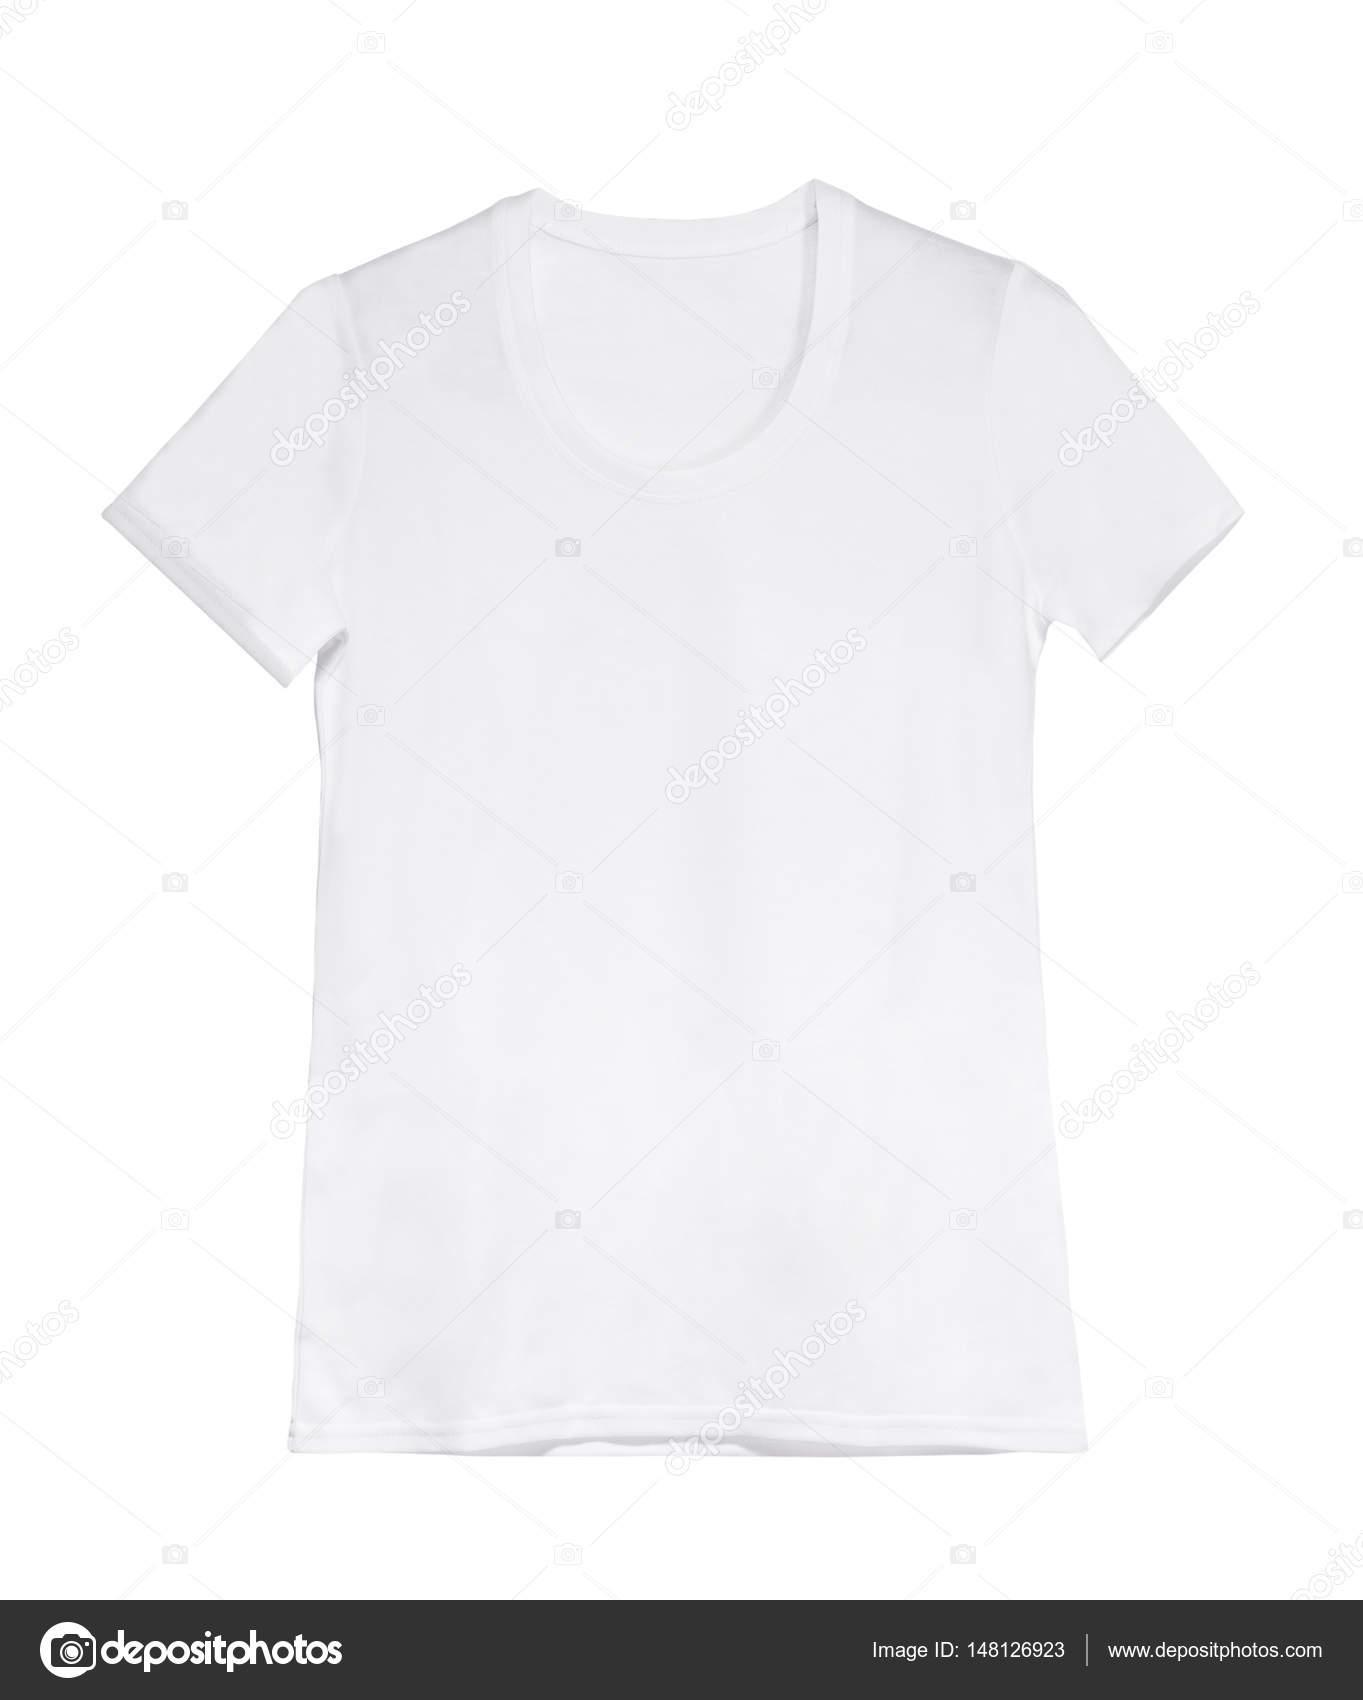 weiße Frau T-shirt auf Kleiderbügel — Stockfoto © GekaSkr #148126923